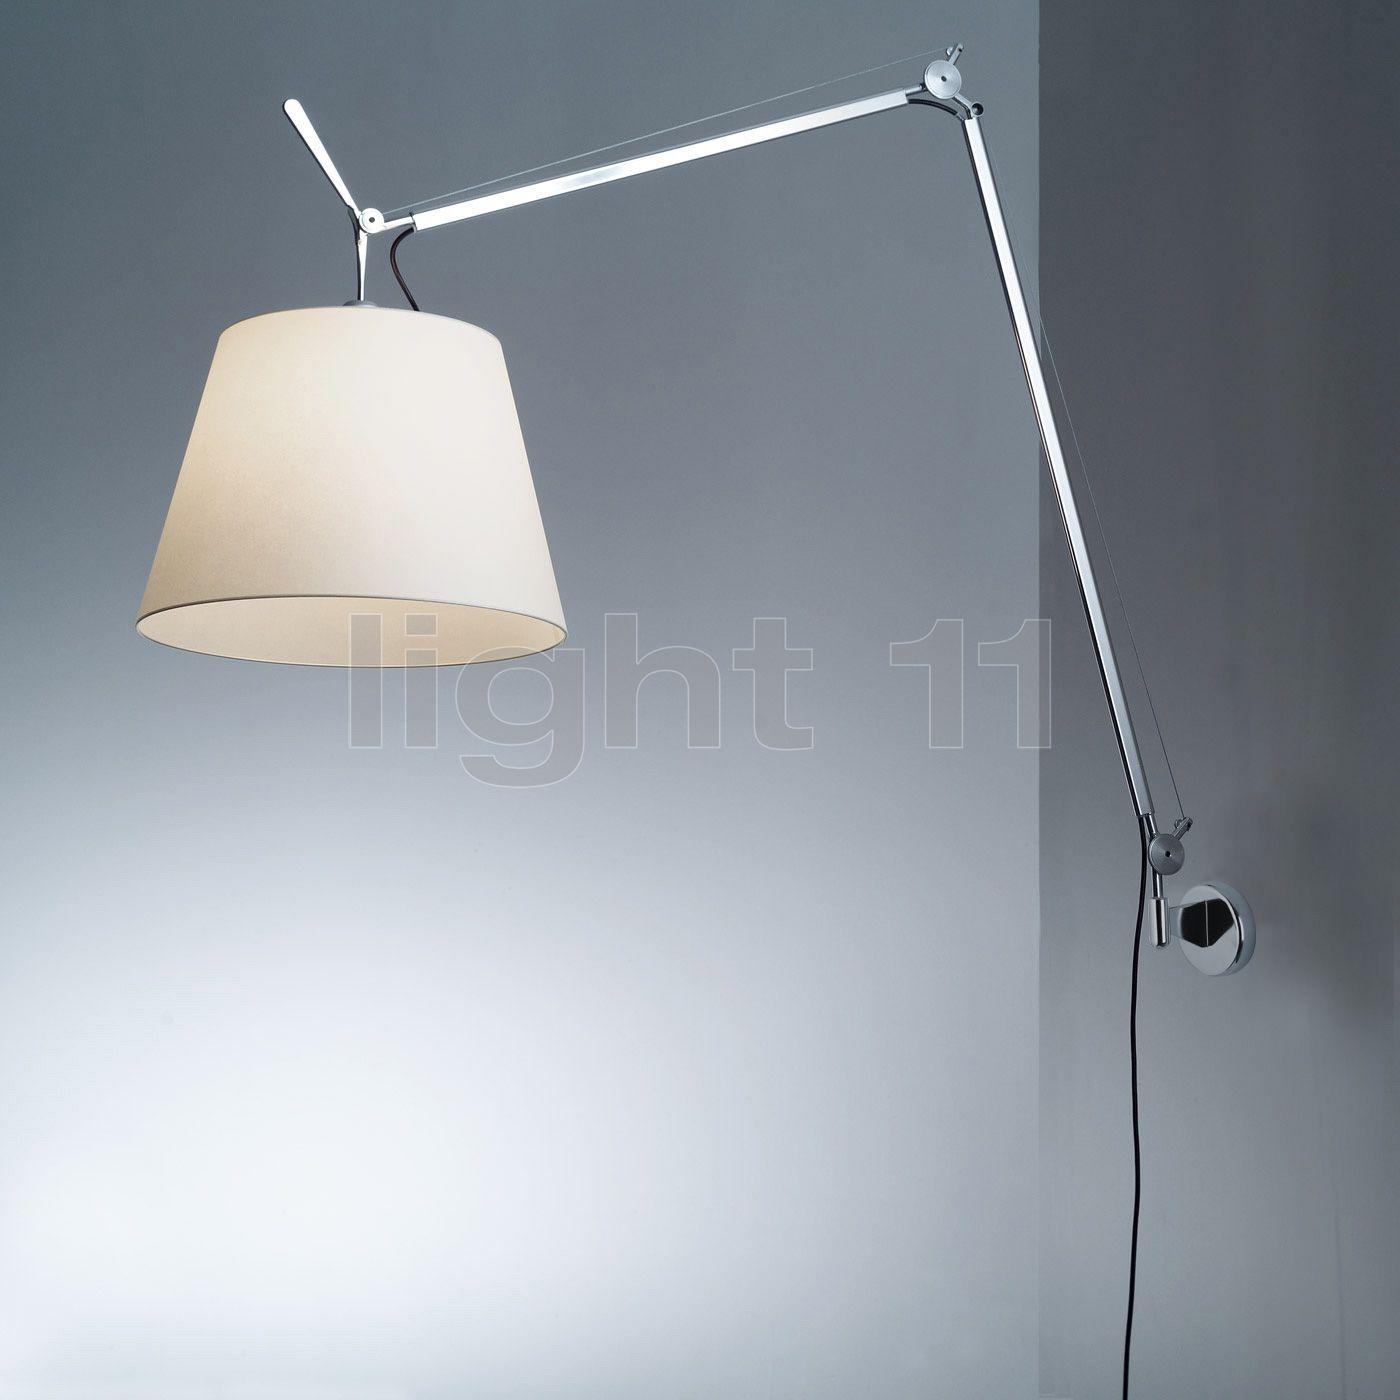 artemide tolomeo mega parete wandlampen lampen verlichting light11nl